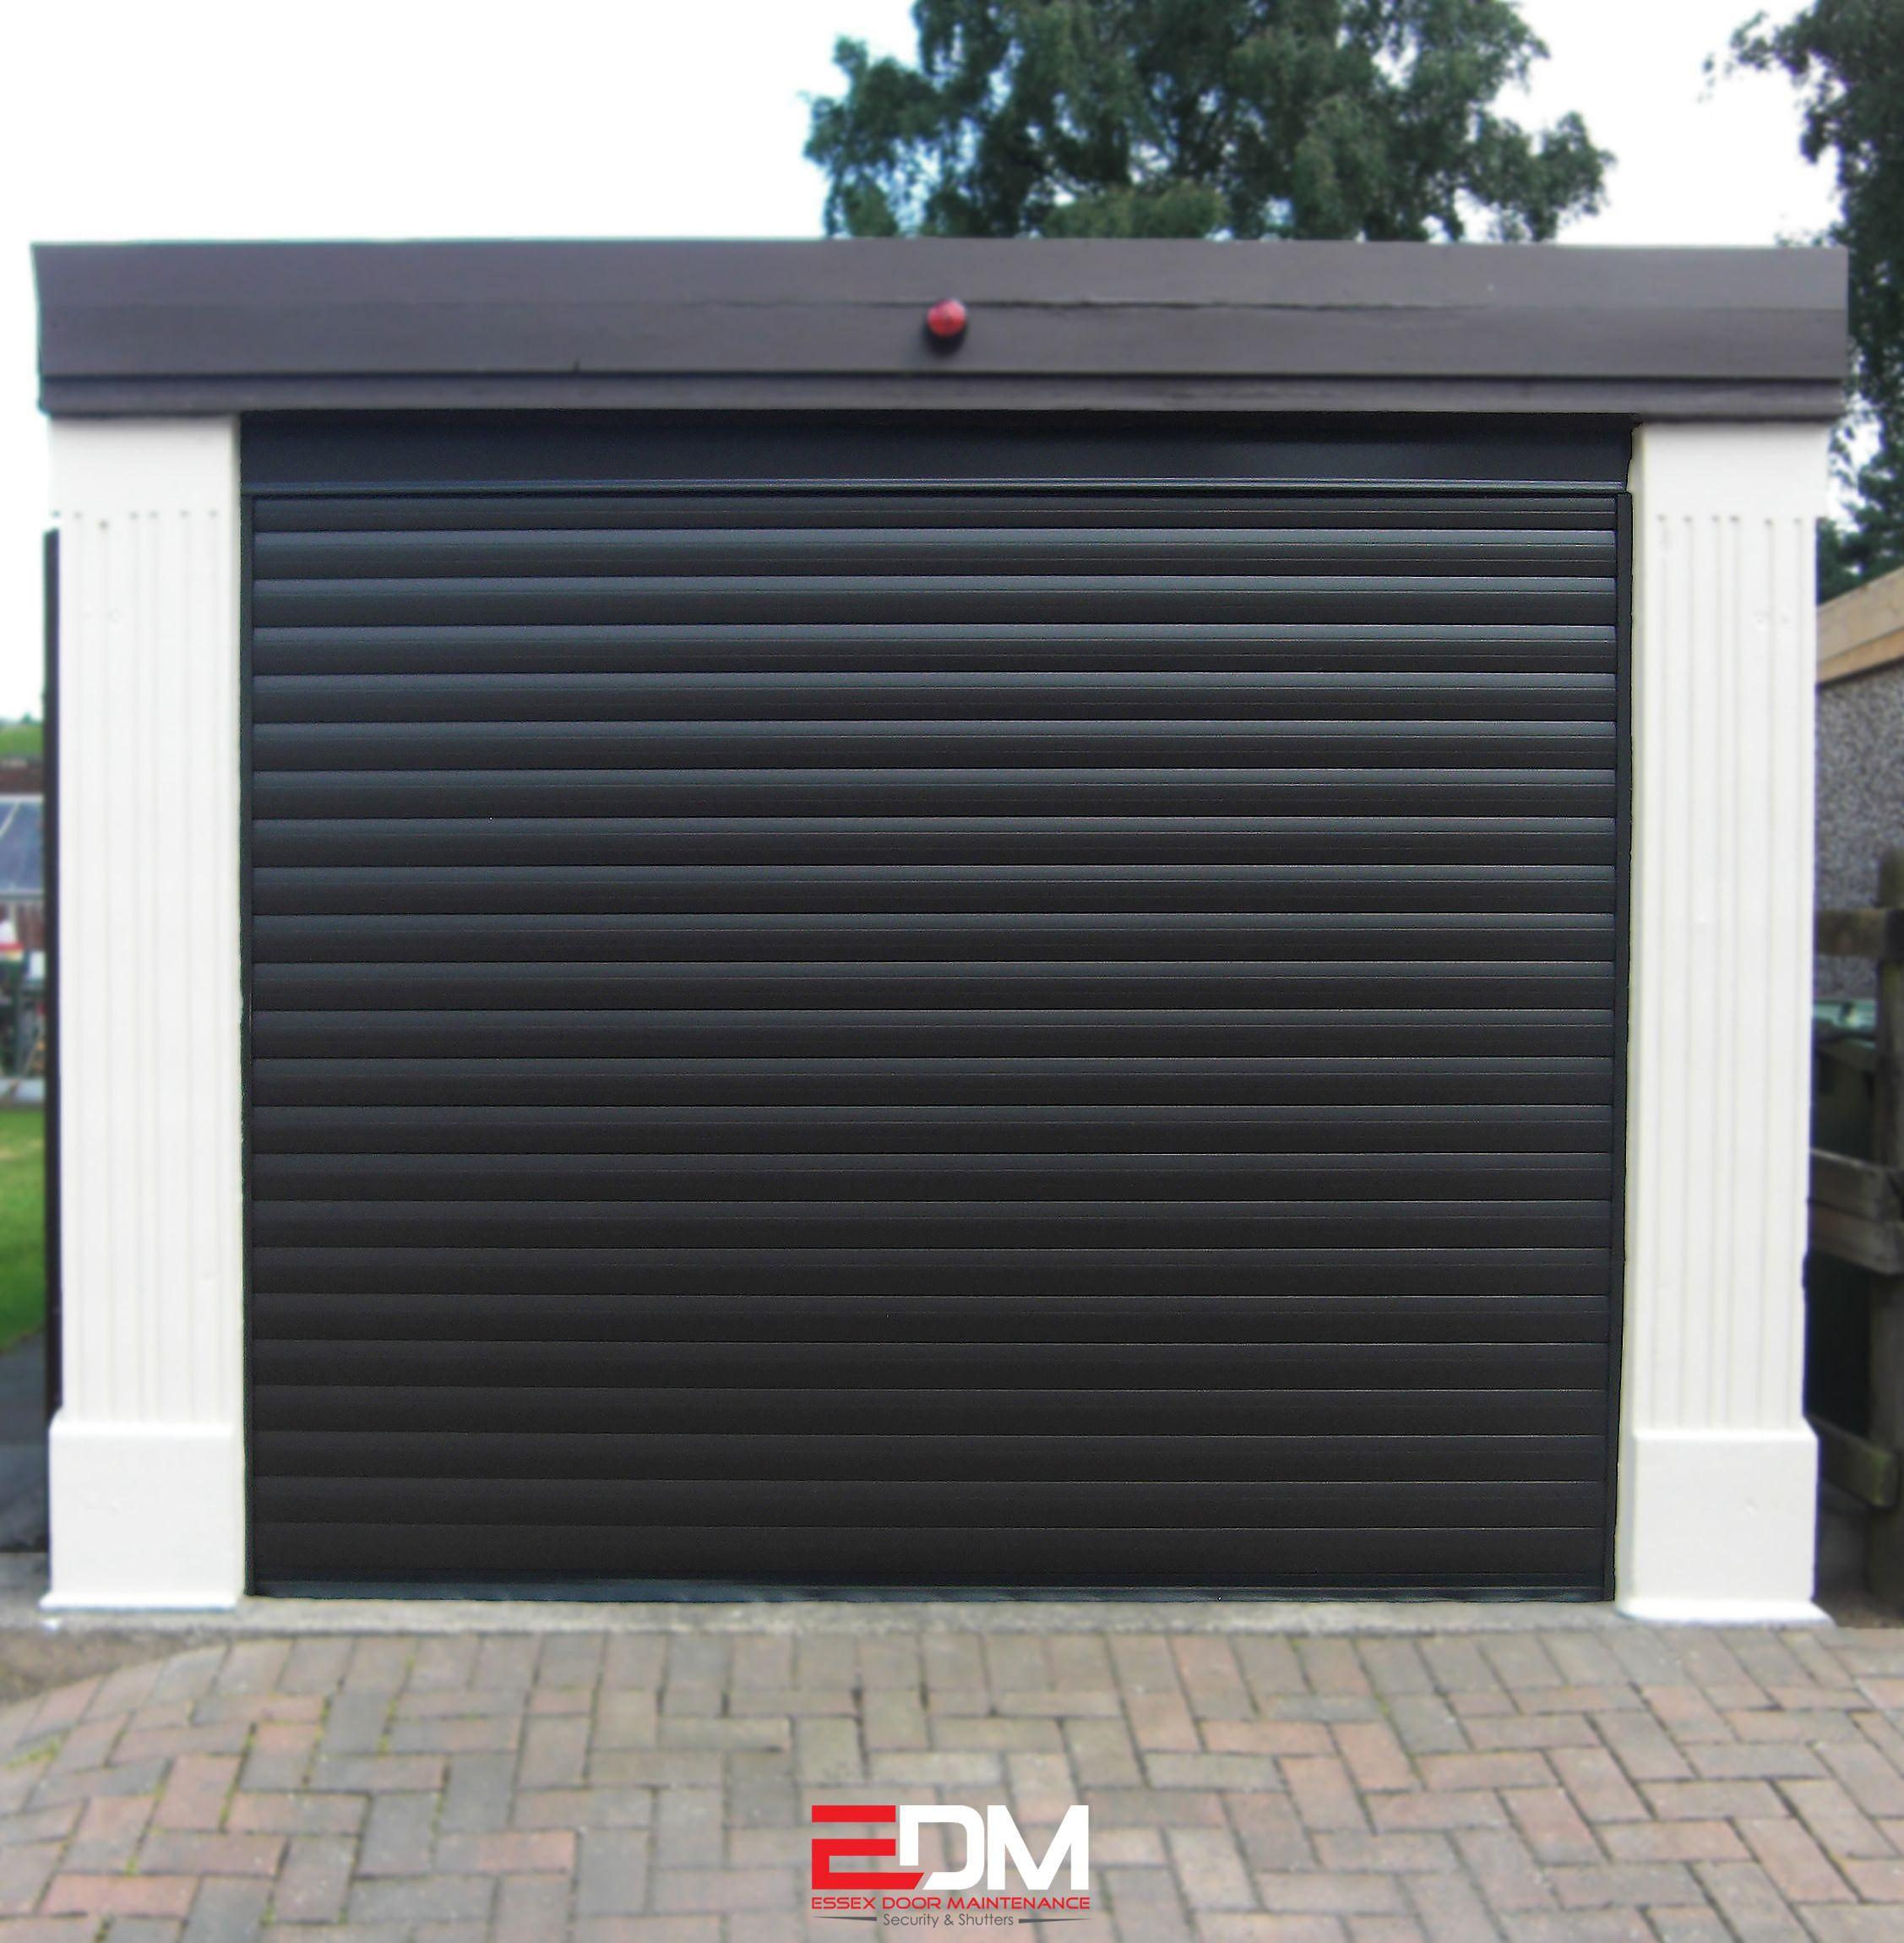 New Roller Shutters Roller Shutters Commercial Shutters Residential Garage Doors